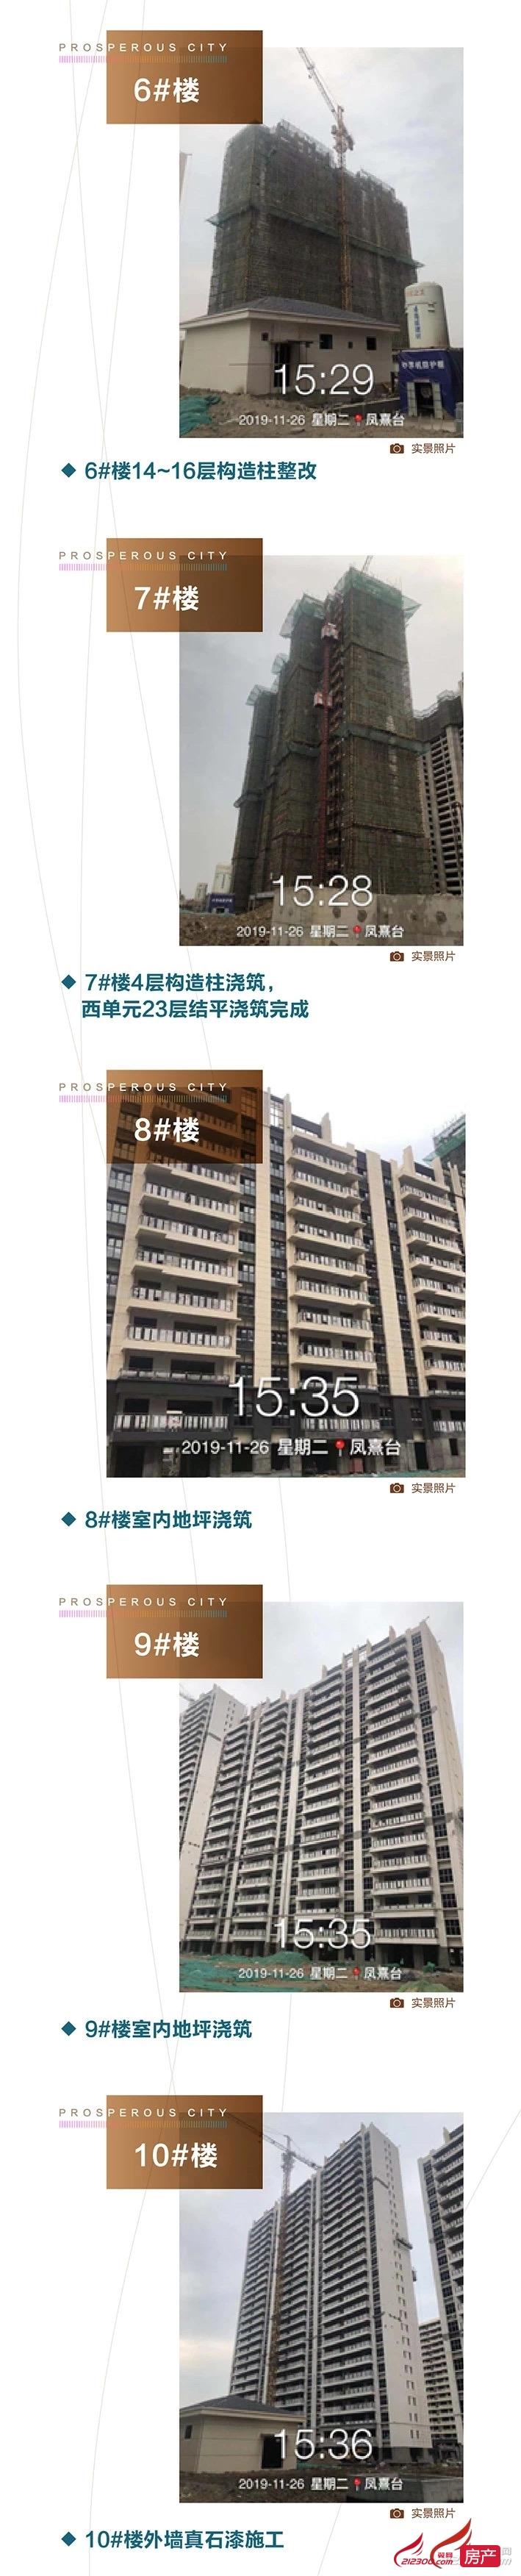 IMG_9191(20191217-102120).JPG